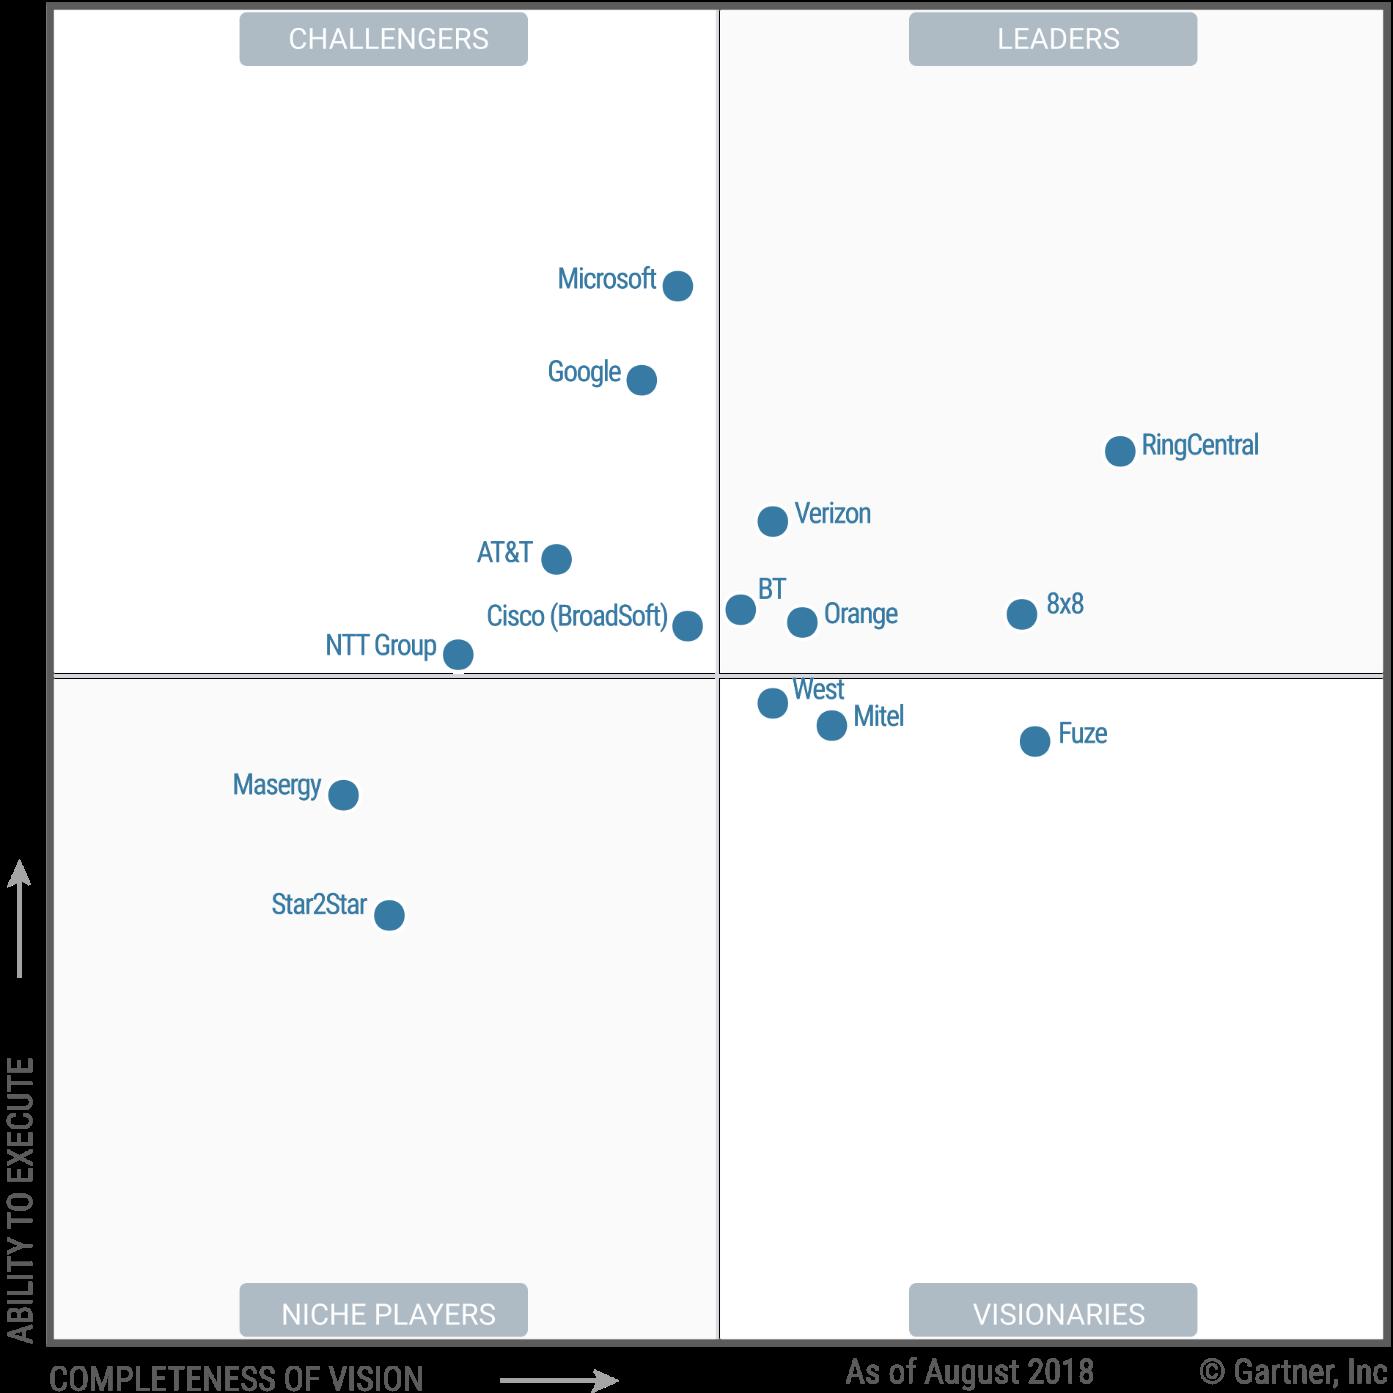 RingCentral Named Leader in the UCaaS Gartner Magic Quadrant